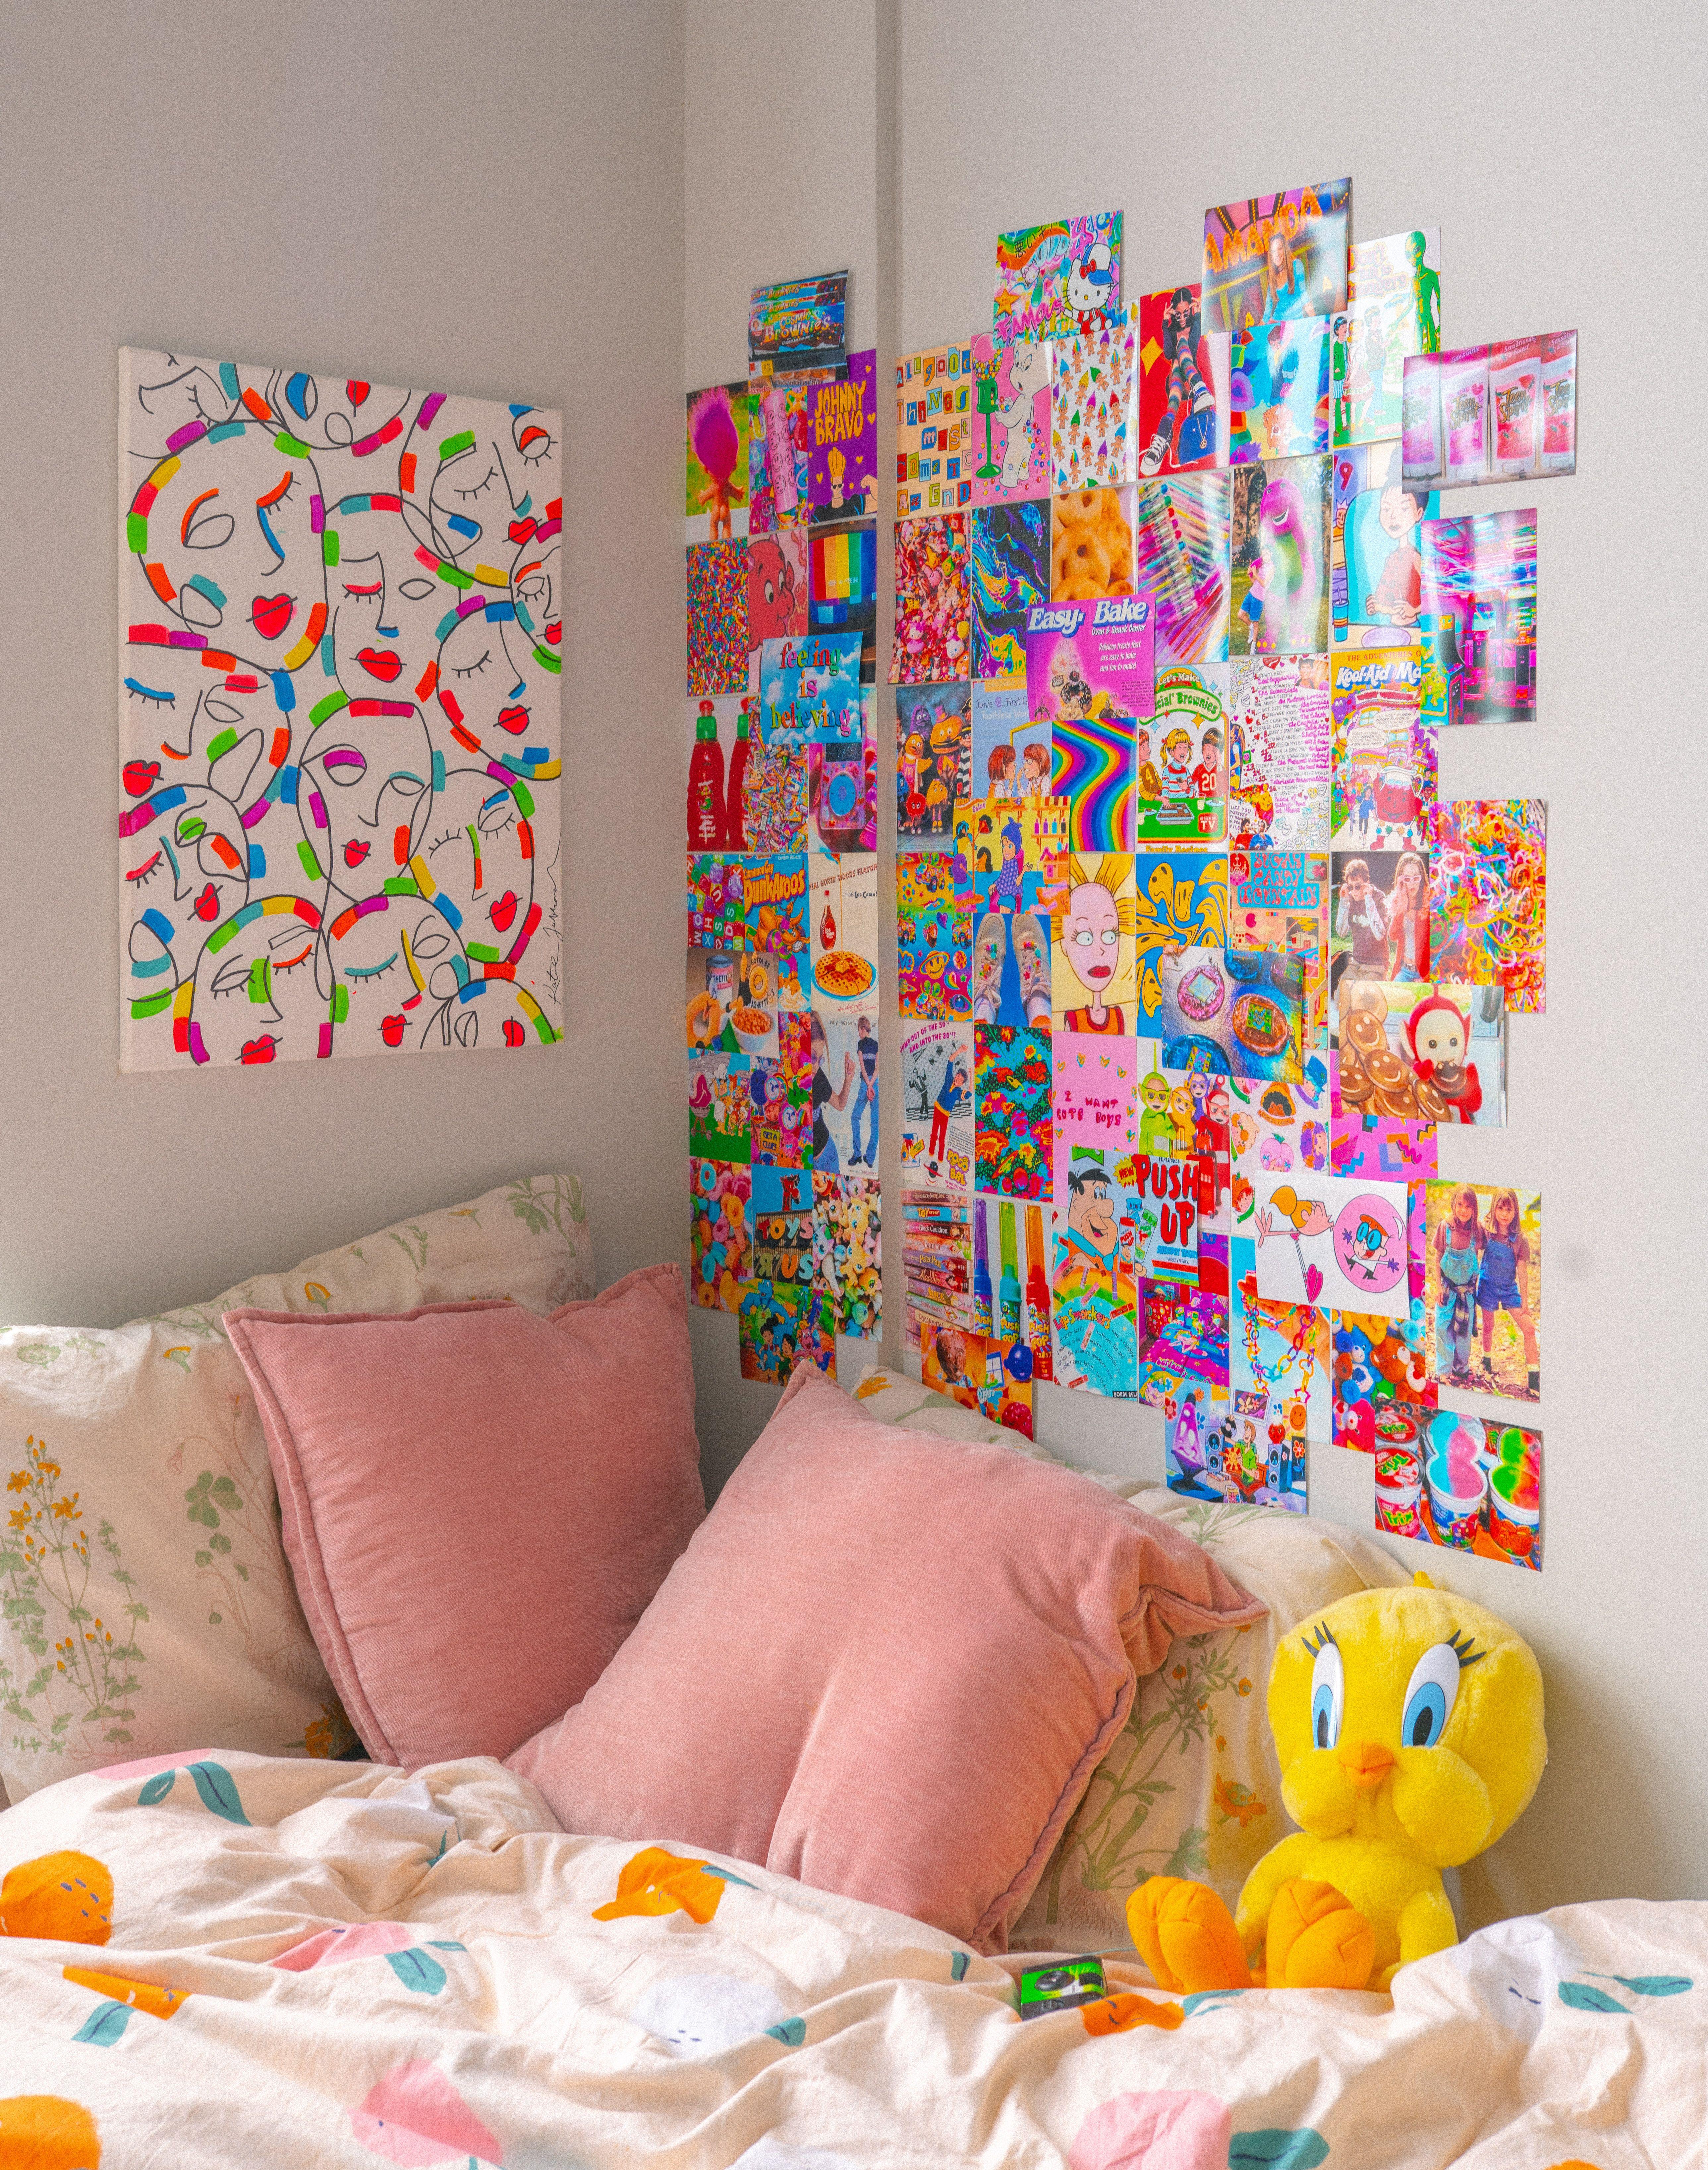 Instant Digital Download 65 Pcs Bad N Boujee Pink Y2k Vsco Etsy In 2021 Vintage Room Decor Neon Room Retro Room